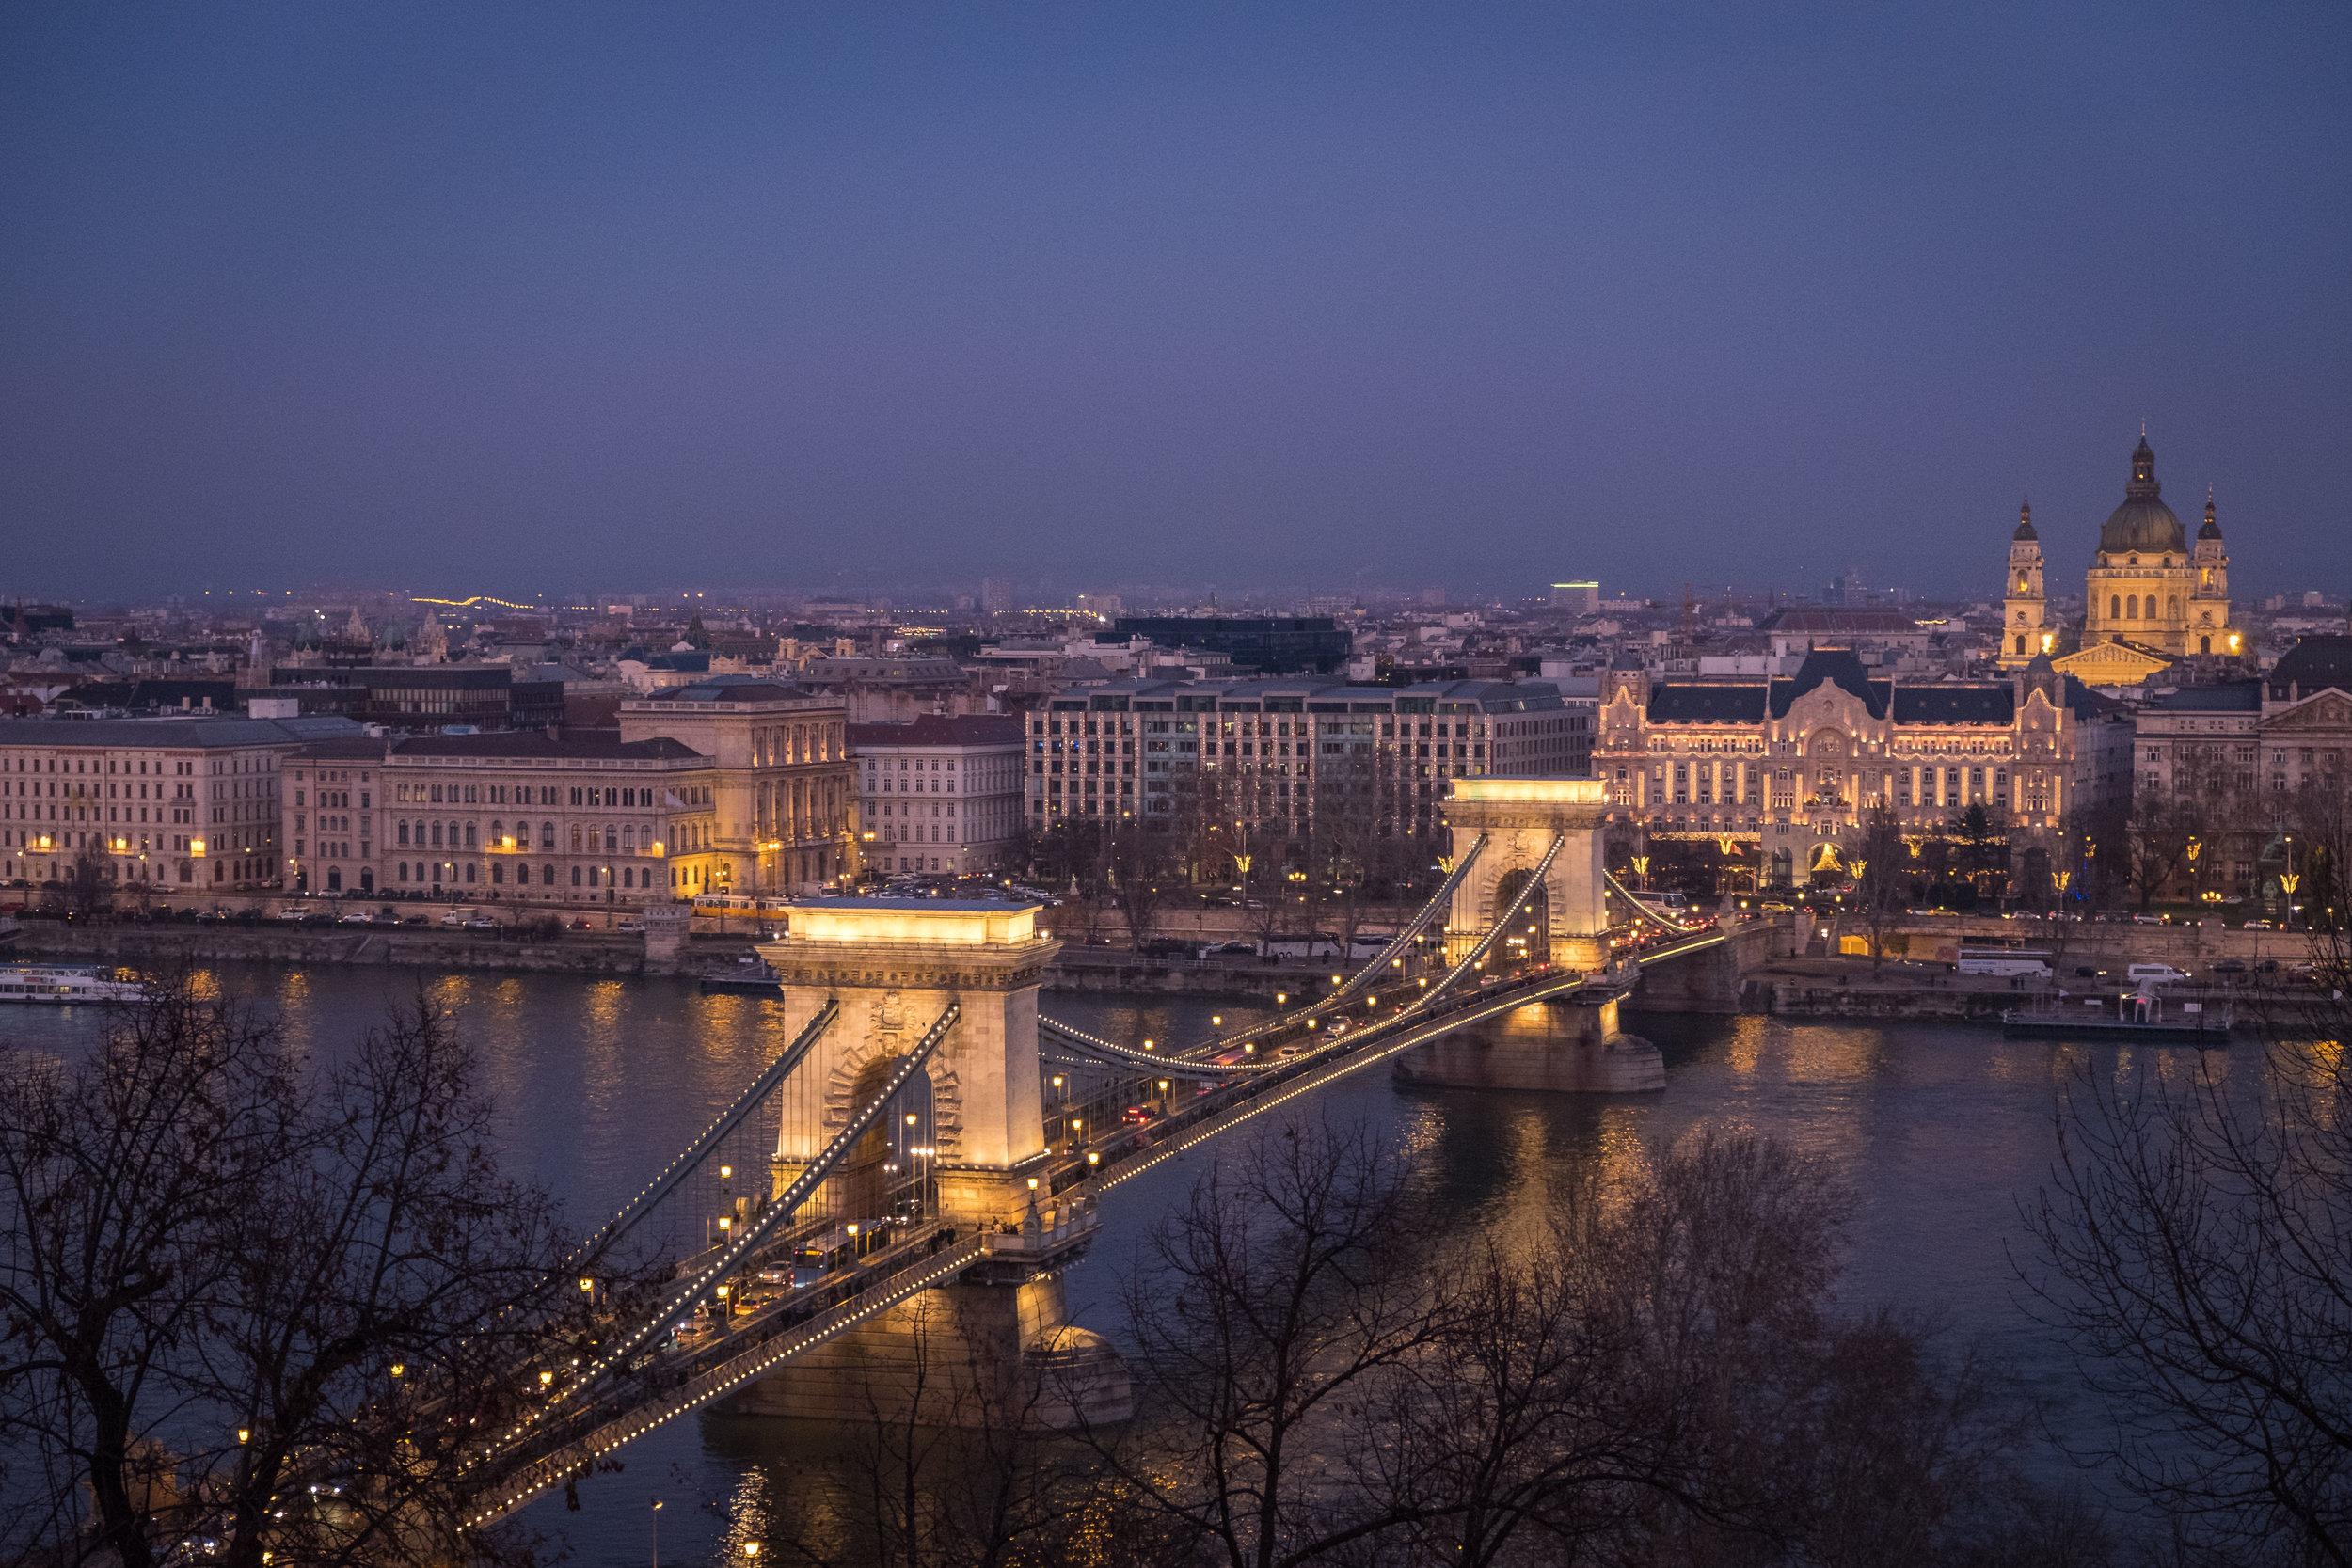 night view of the Széchenyi Chain Bridge